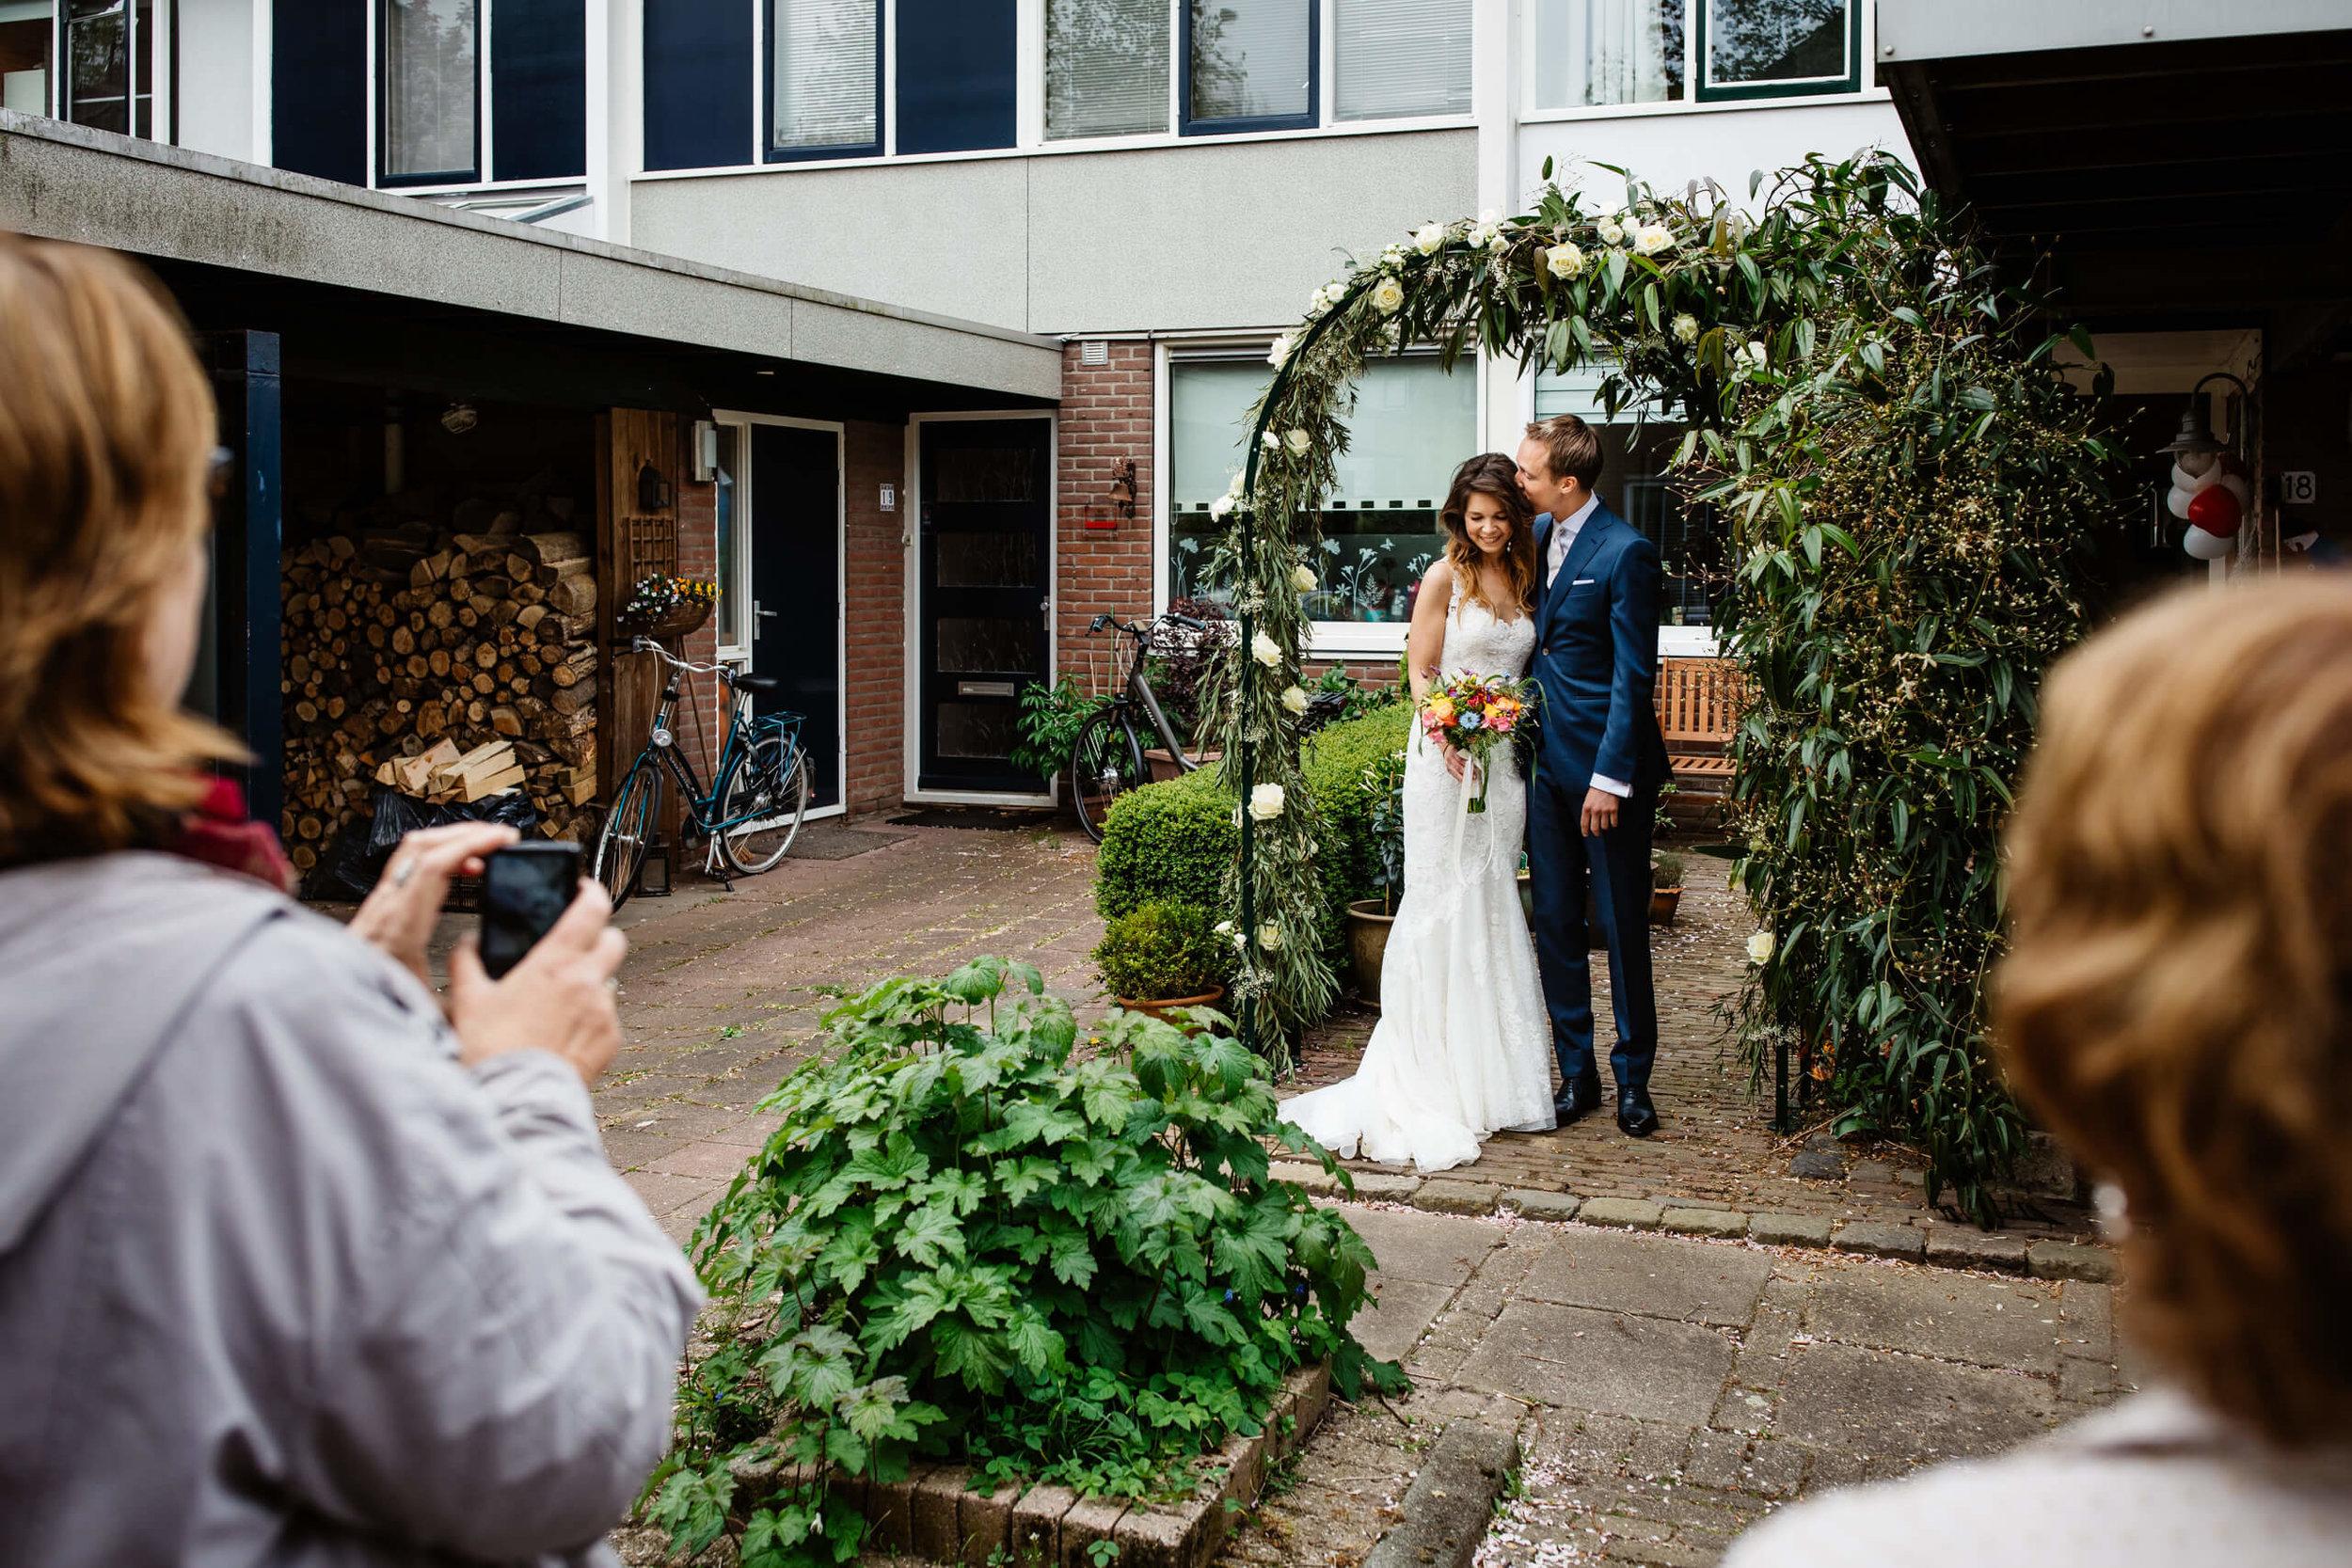 bruidsfotograaf-landgoed-groot-warnsborn-6.jpg